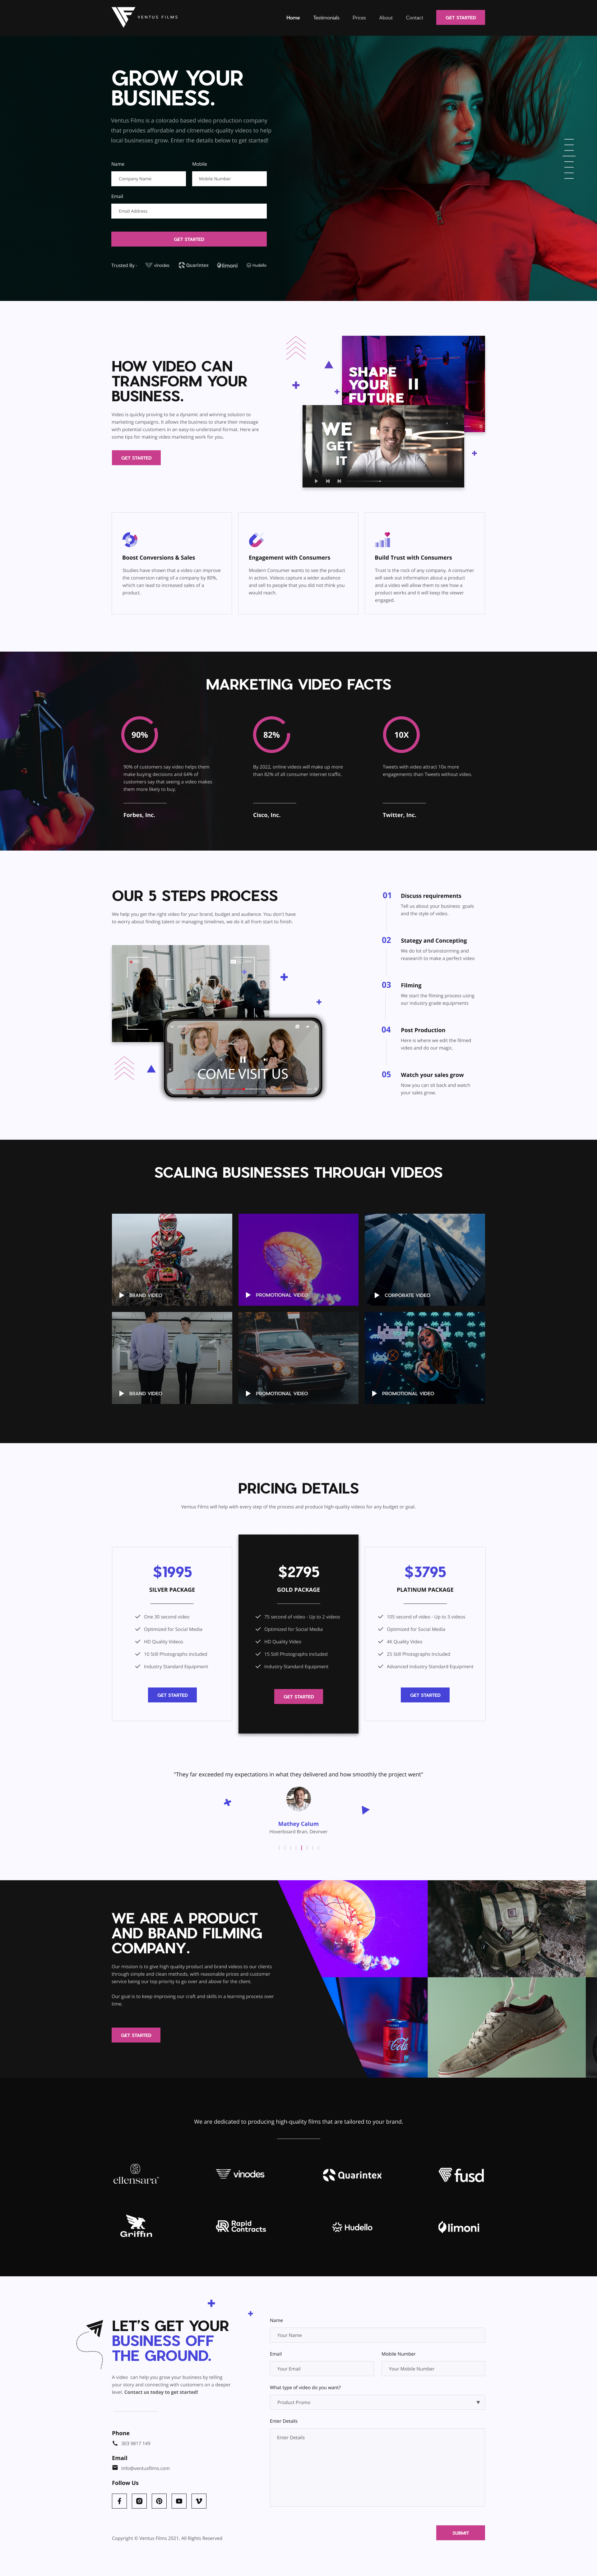 Film Production Company seeks eye catching website!